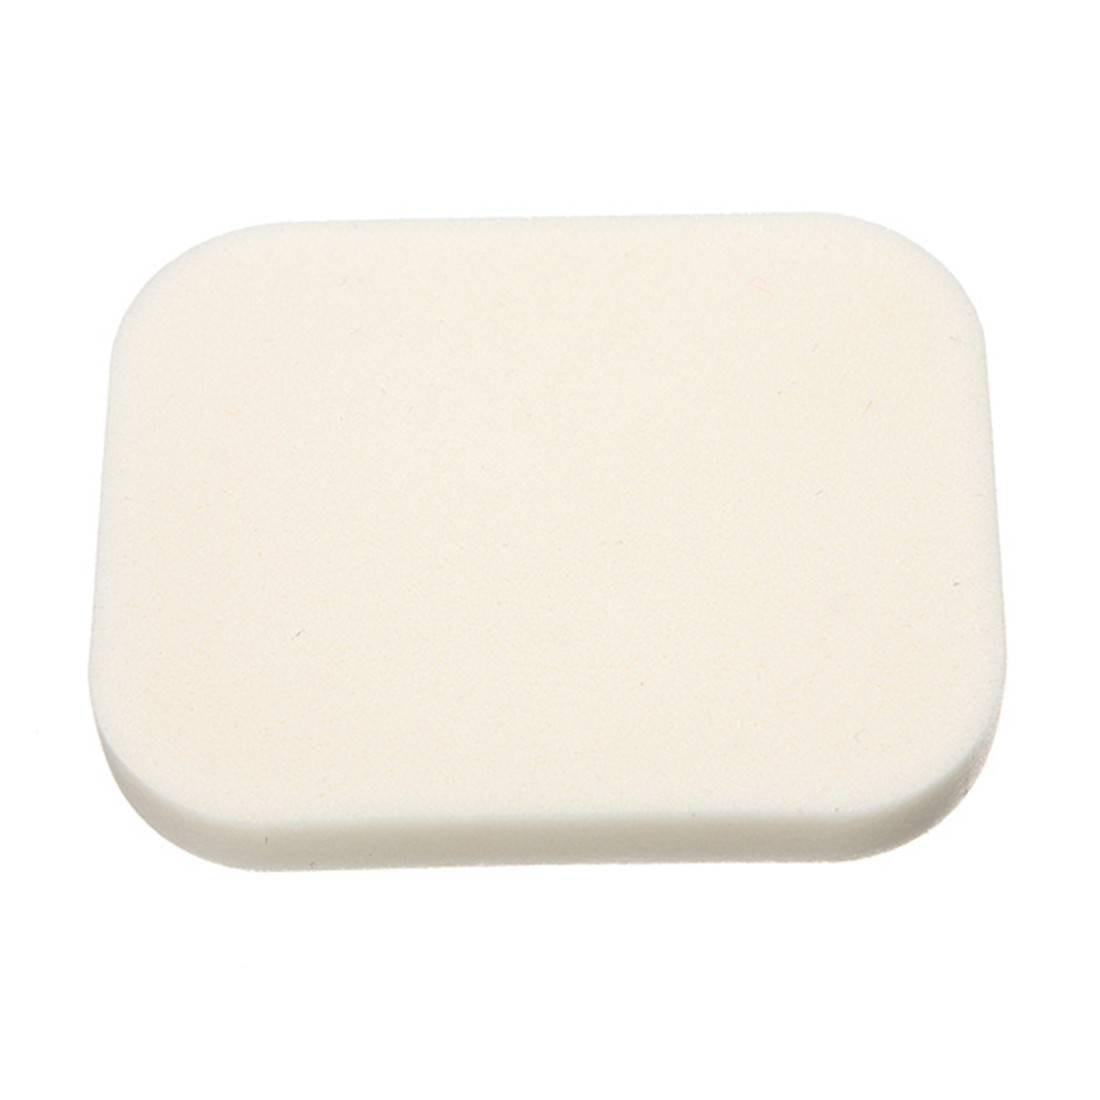 5PACK (6Pcs Facial Soft Sponge Pad Face Makeup Blenders Cosmetic Powder Foundation Puff